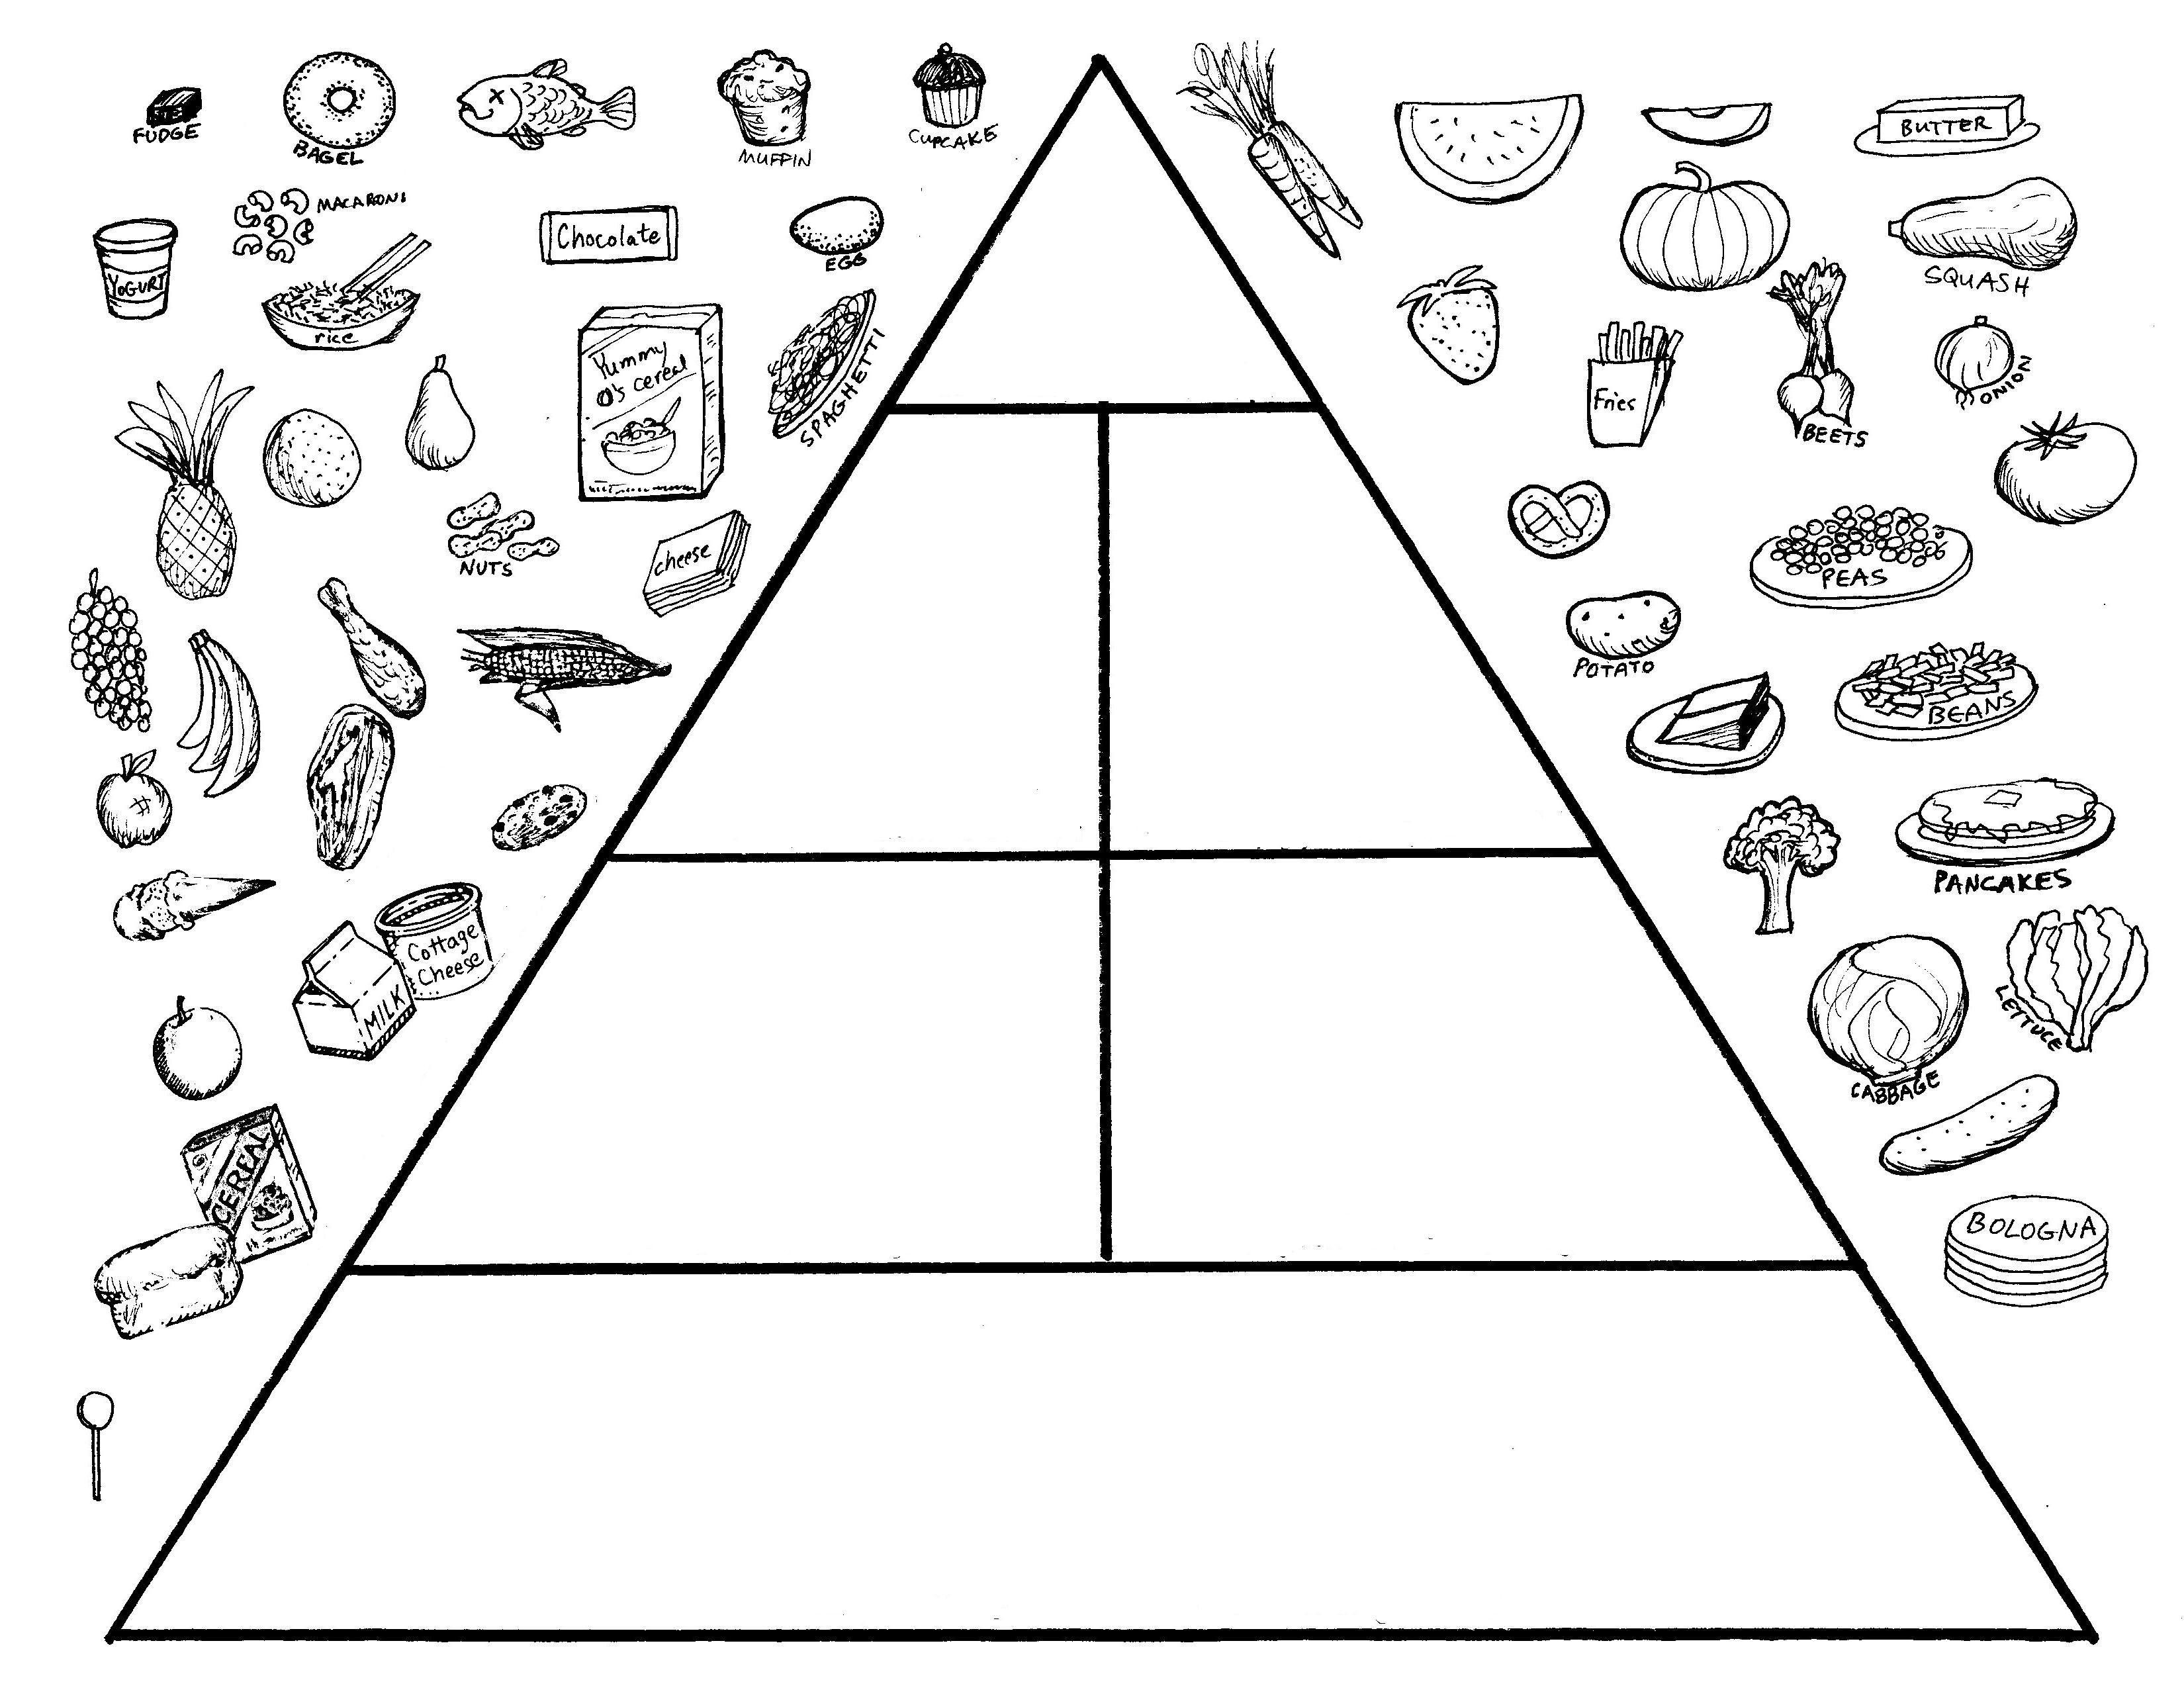 Printable Food Pyramid Activities | Food Pyramid Coloring Pages - Free Printable Food Pyramid